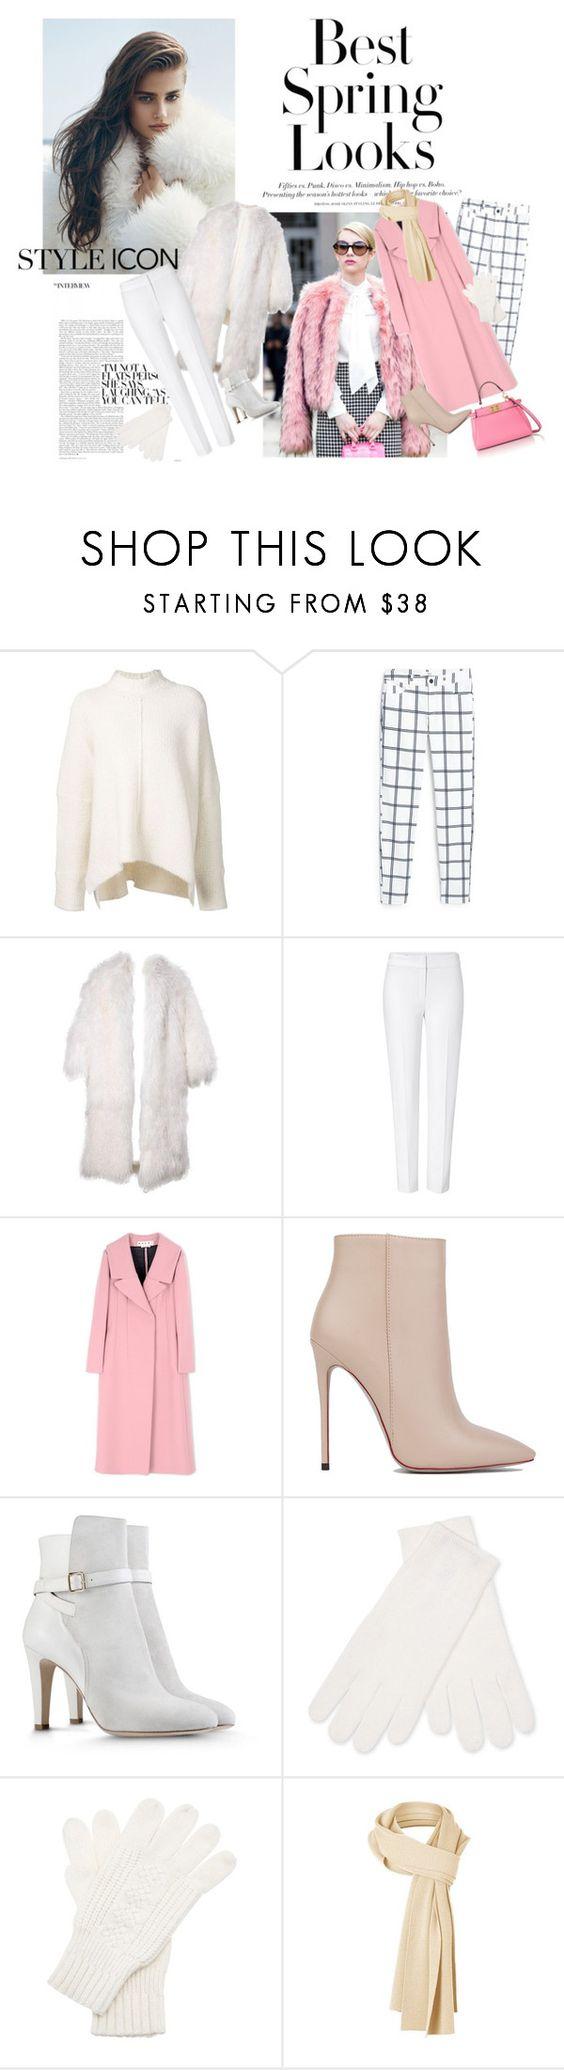 """Spring look"" by fashionxfab ❤ liked on Polyvore featuring H&M, URBAN ZEN, MANGO, ESCADA, Marni, Akira Black Label, Alberta Ferretti, White + Warren, White House Black Market and Fendi"